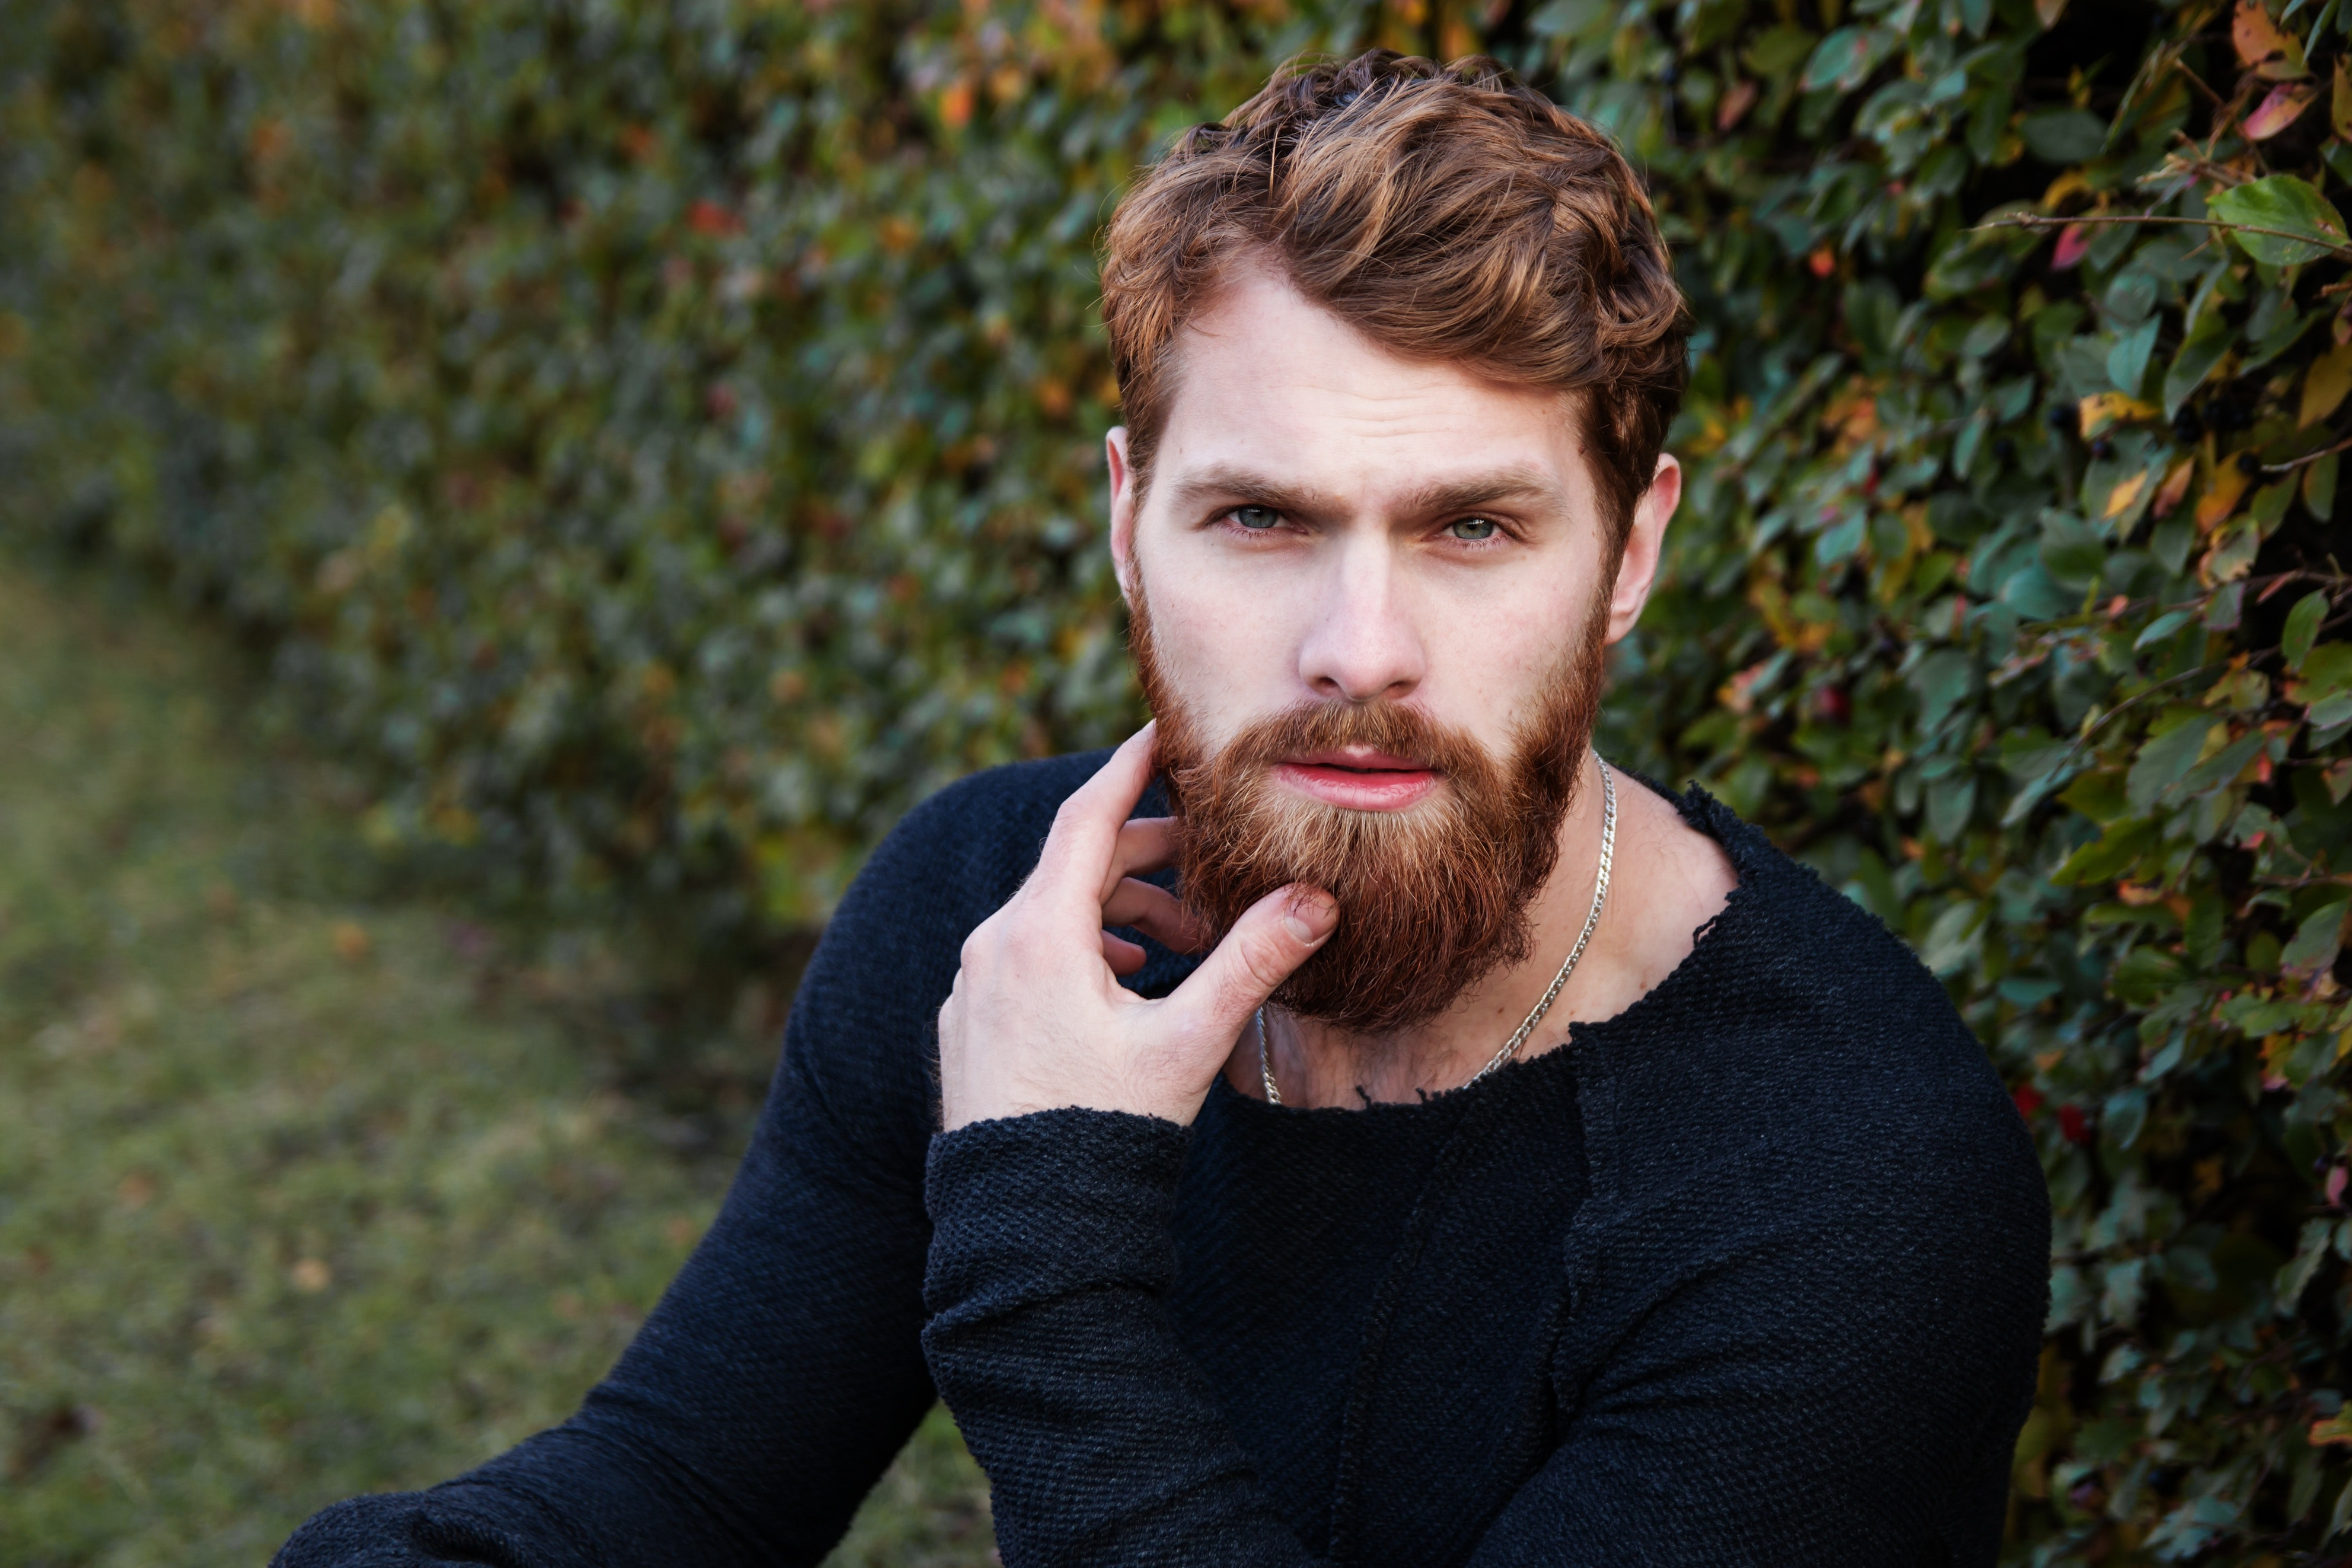 tratamento de barba